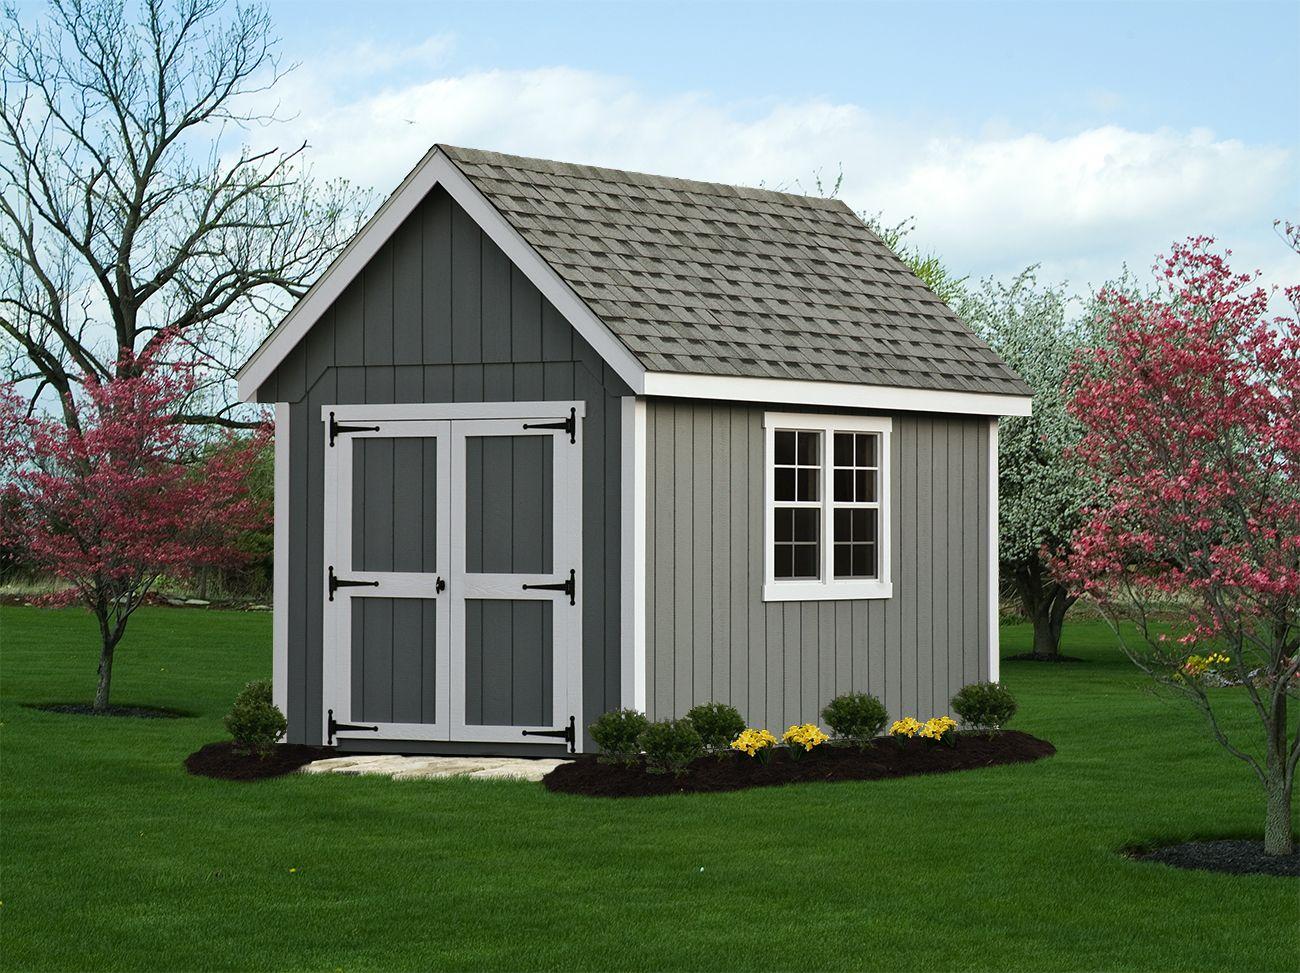 8x12 Garden A Frame Www Bestinbackyards Com Backyard Sheds Outdoor Sheds Outdoor Storage Sheds